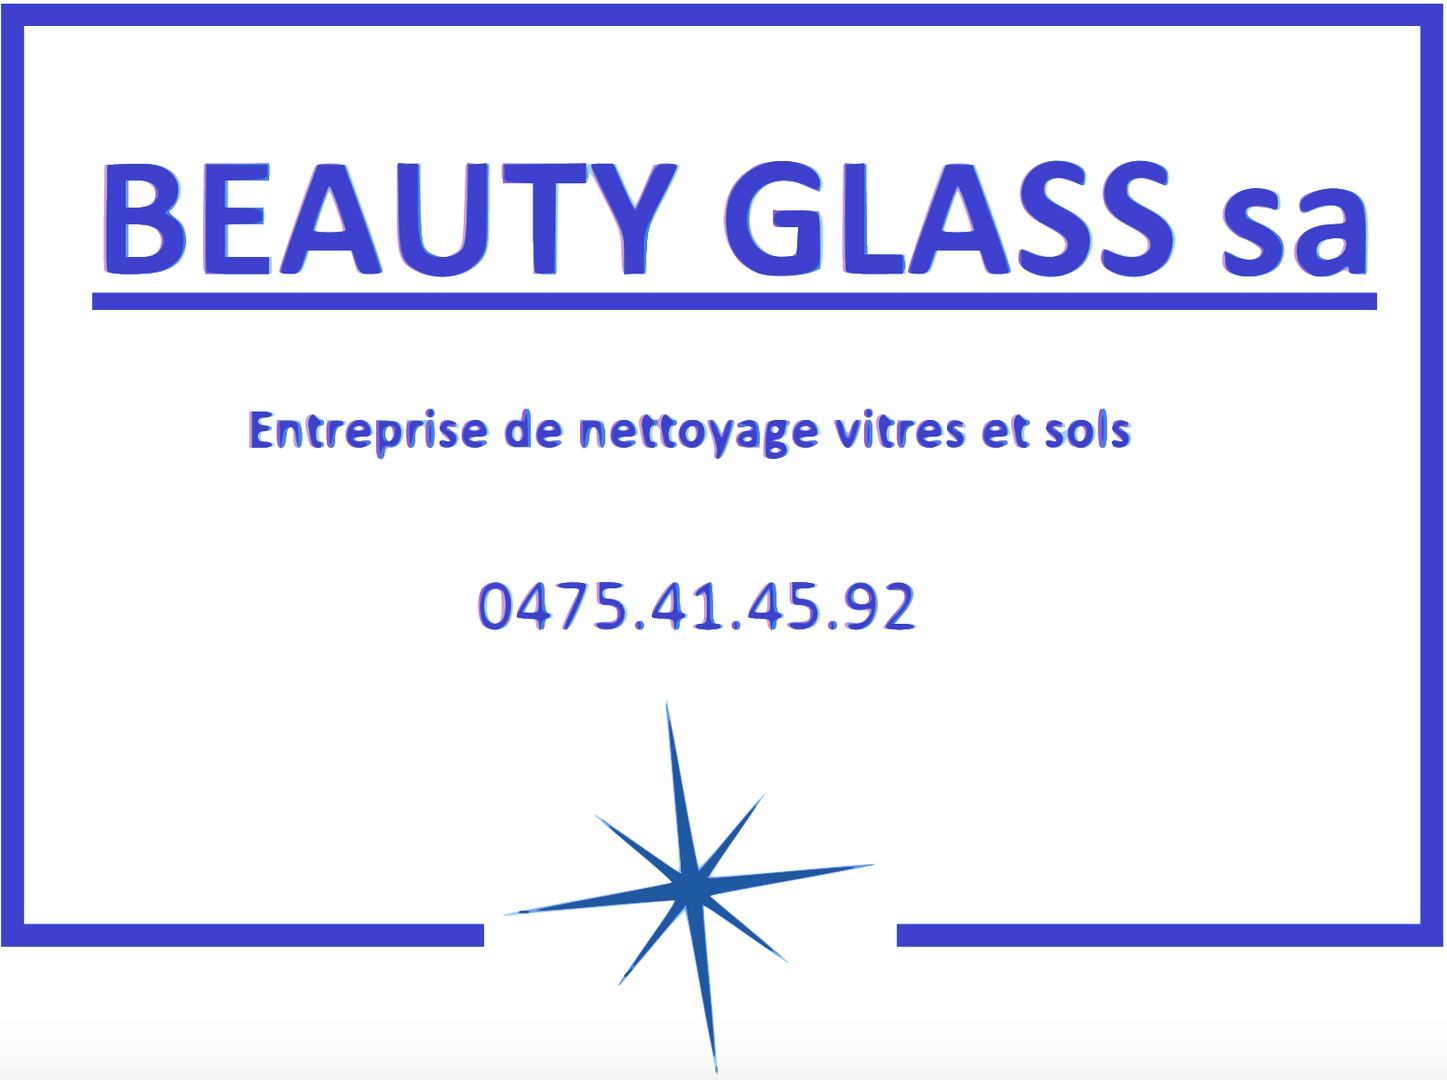 Beauty Glass